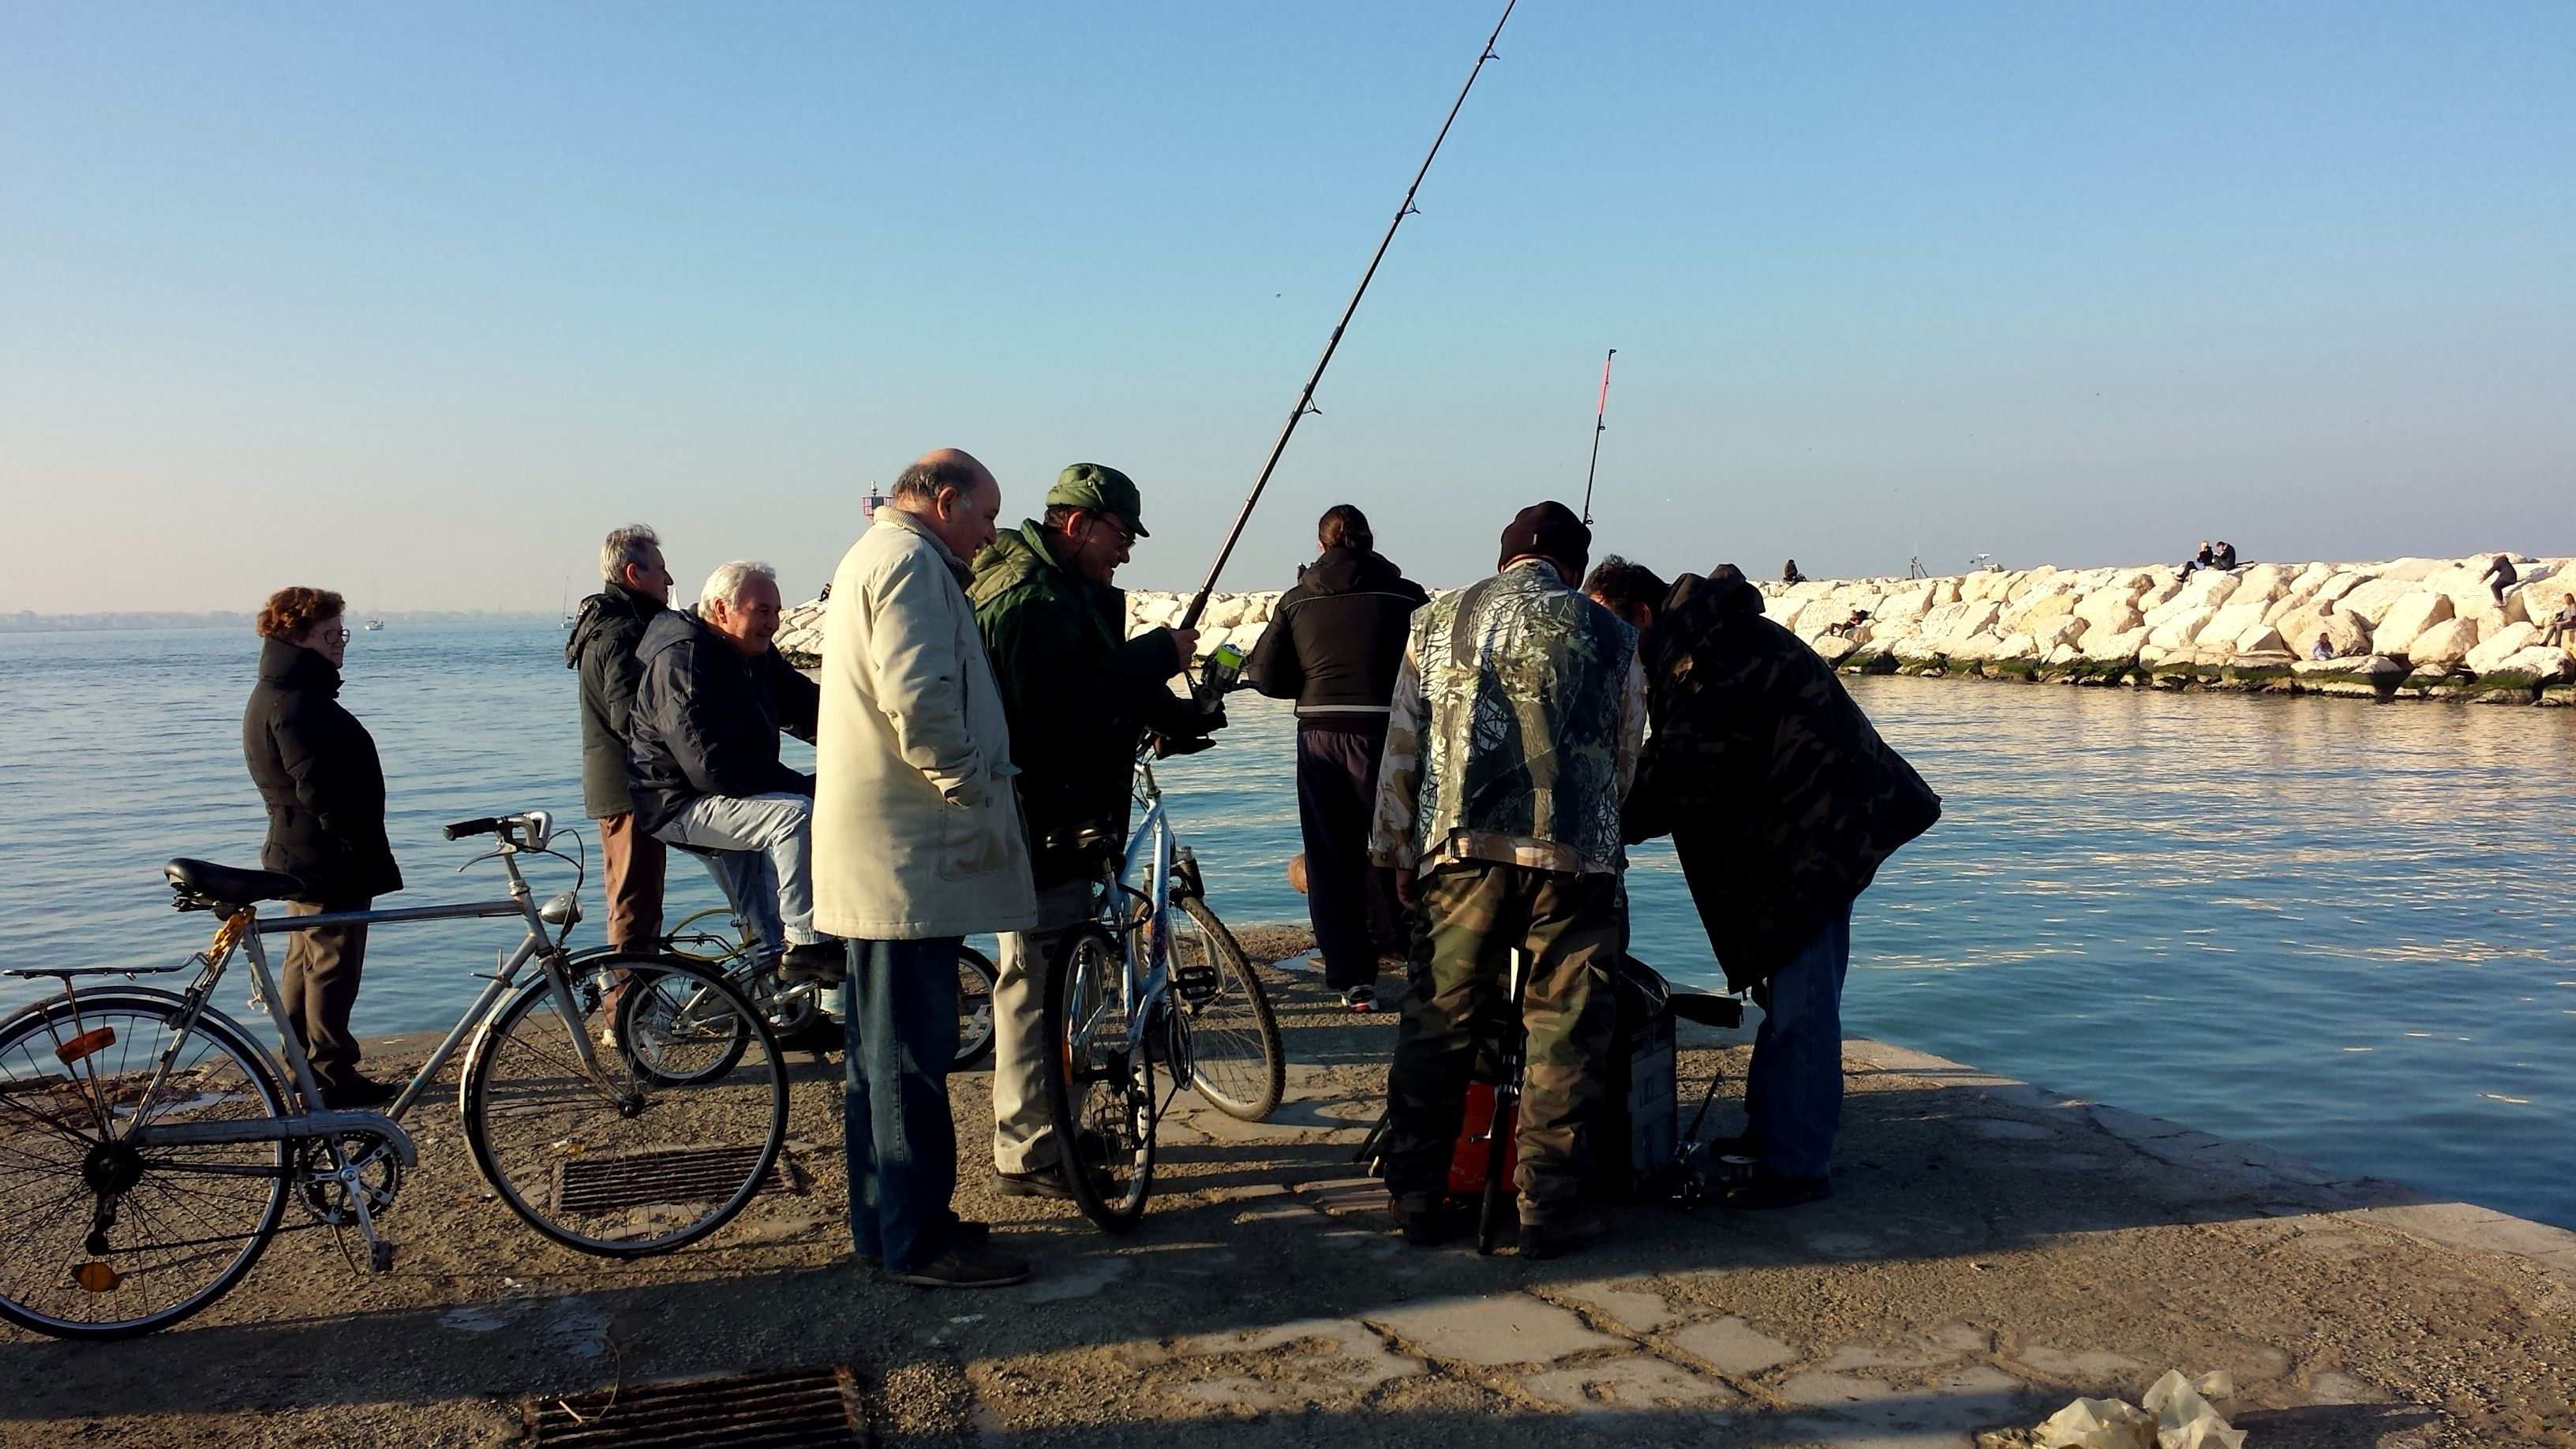 pescatori fishermen